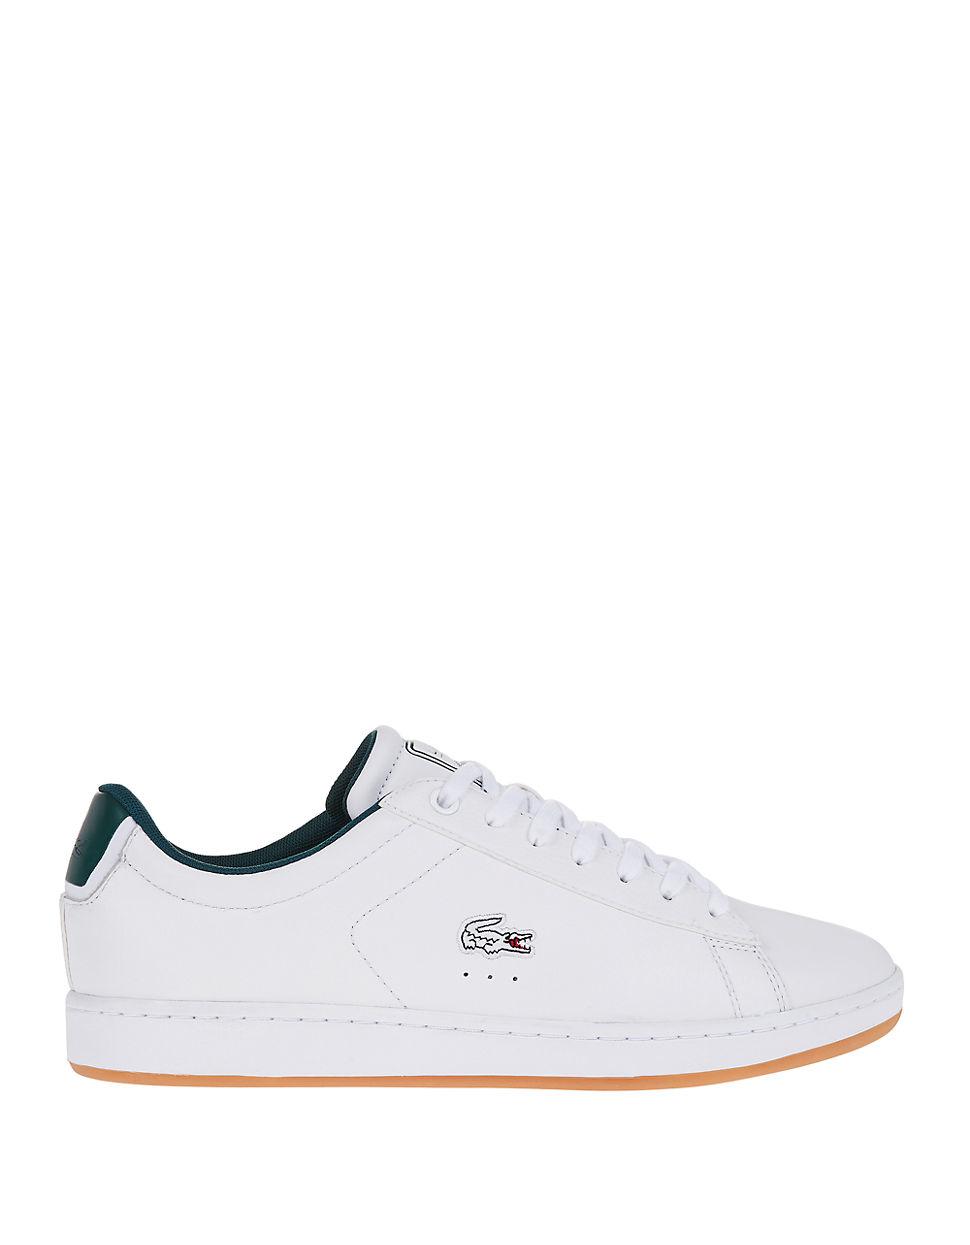 Lacoste Black Fashion Sneakers